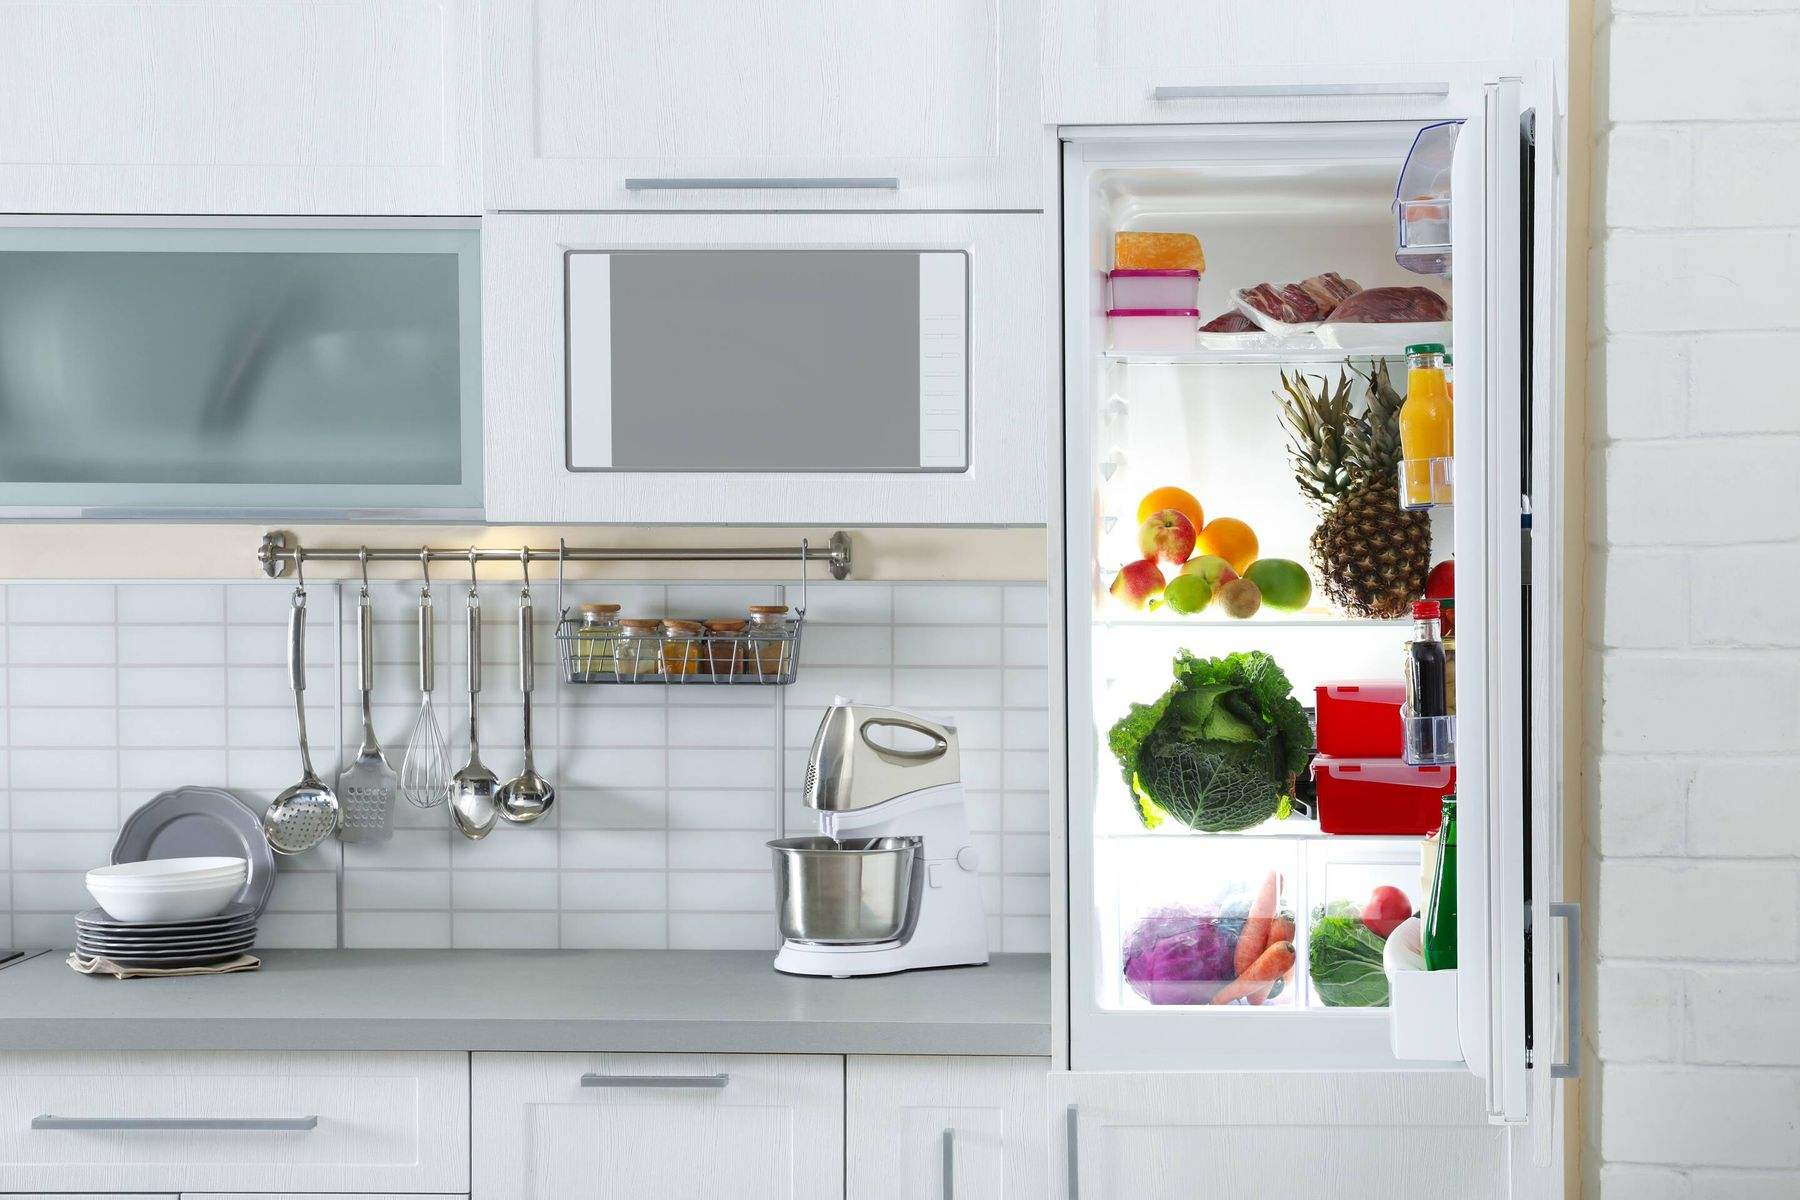 Ciptakan Kulkas Bersih dan Bebas Bau dengan Tips Ini